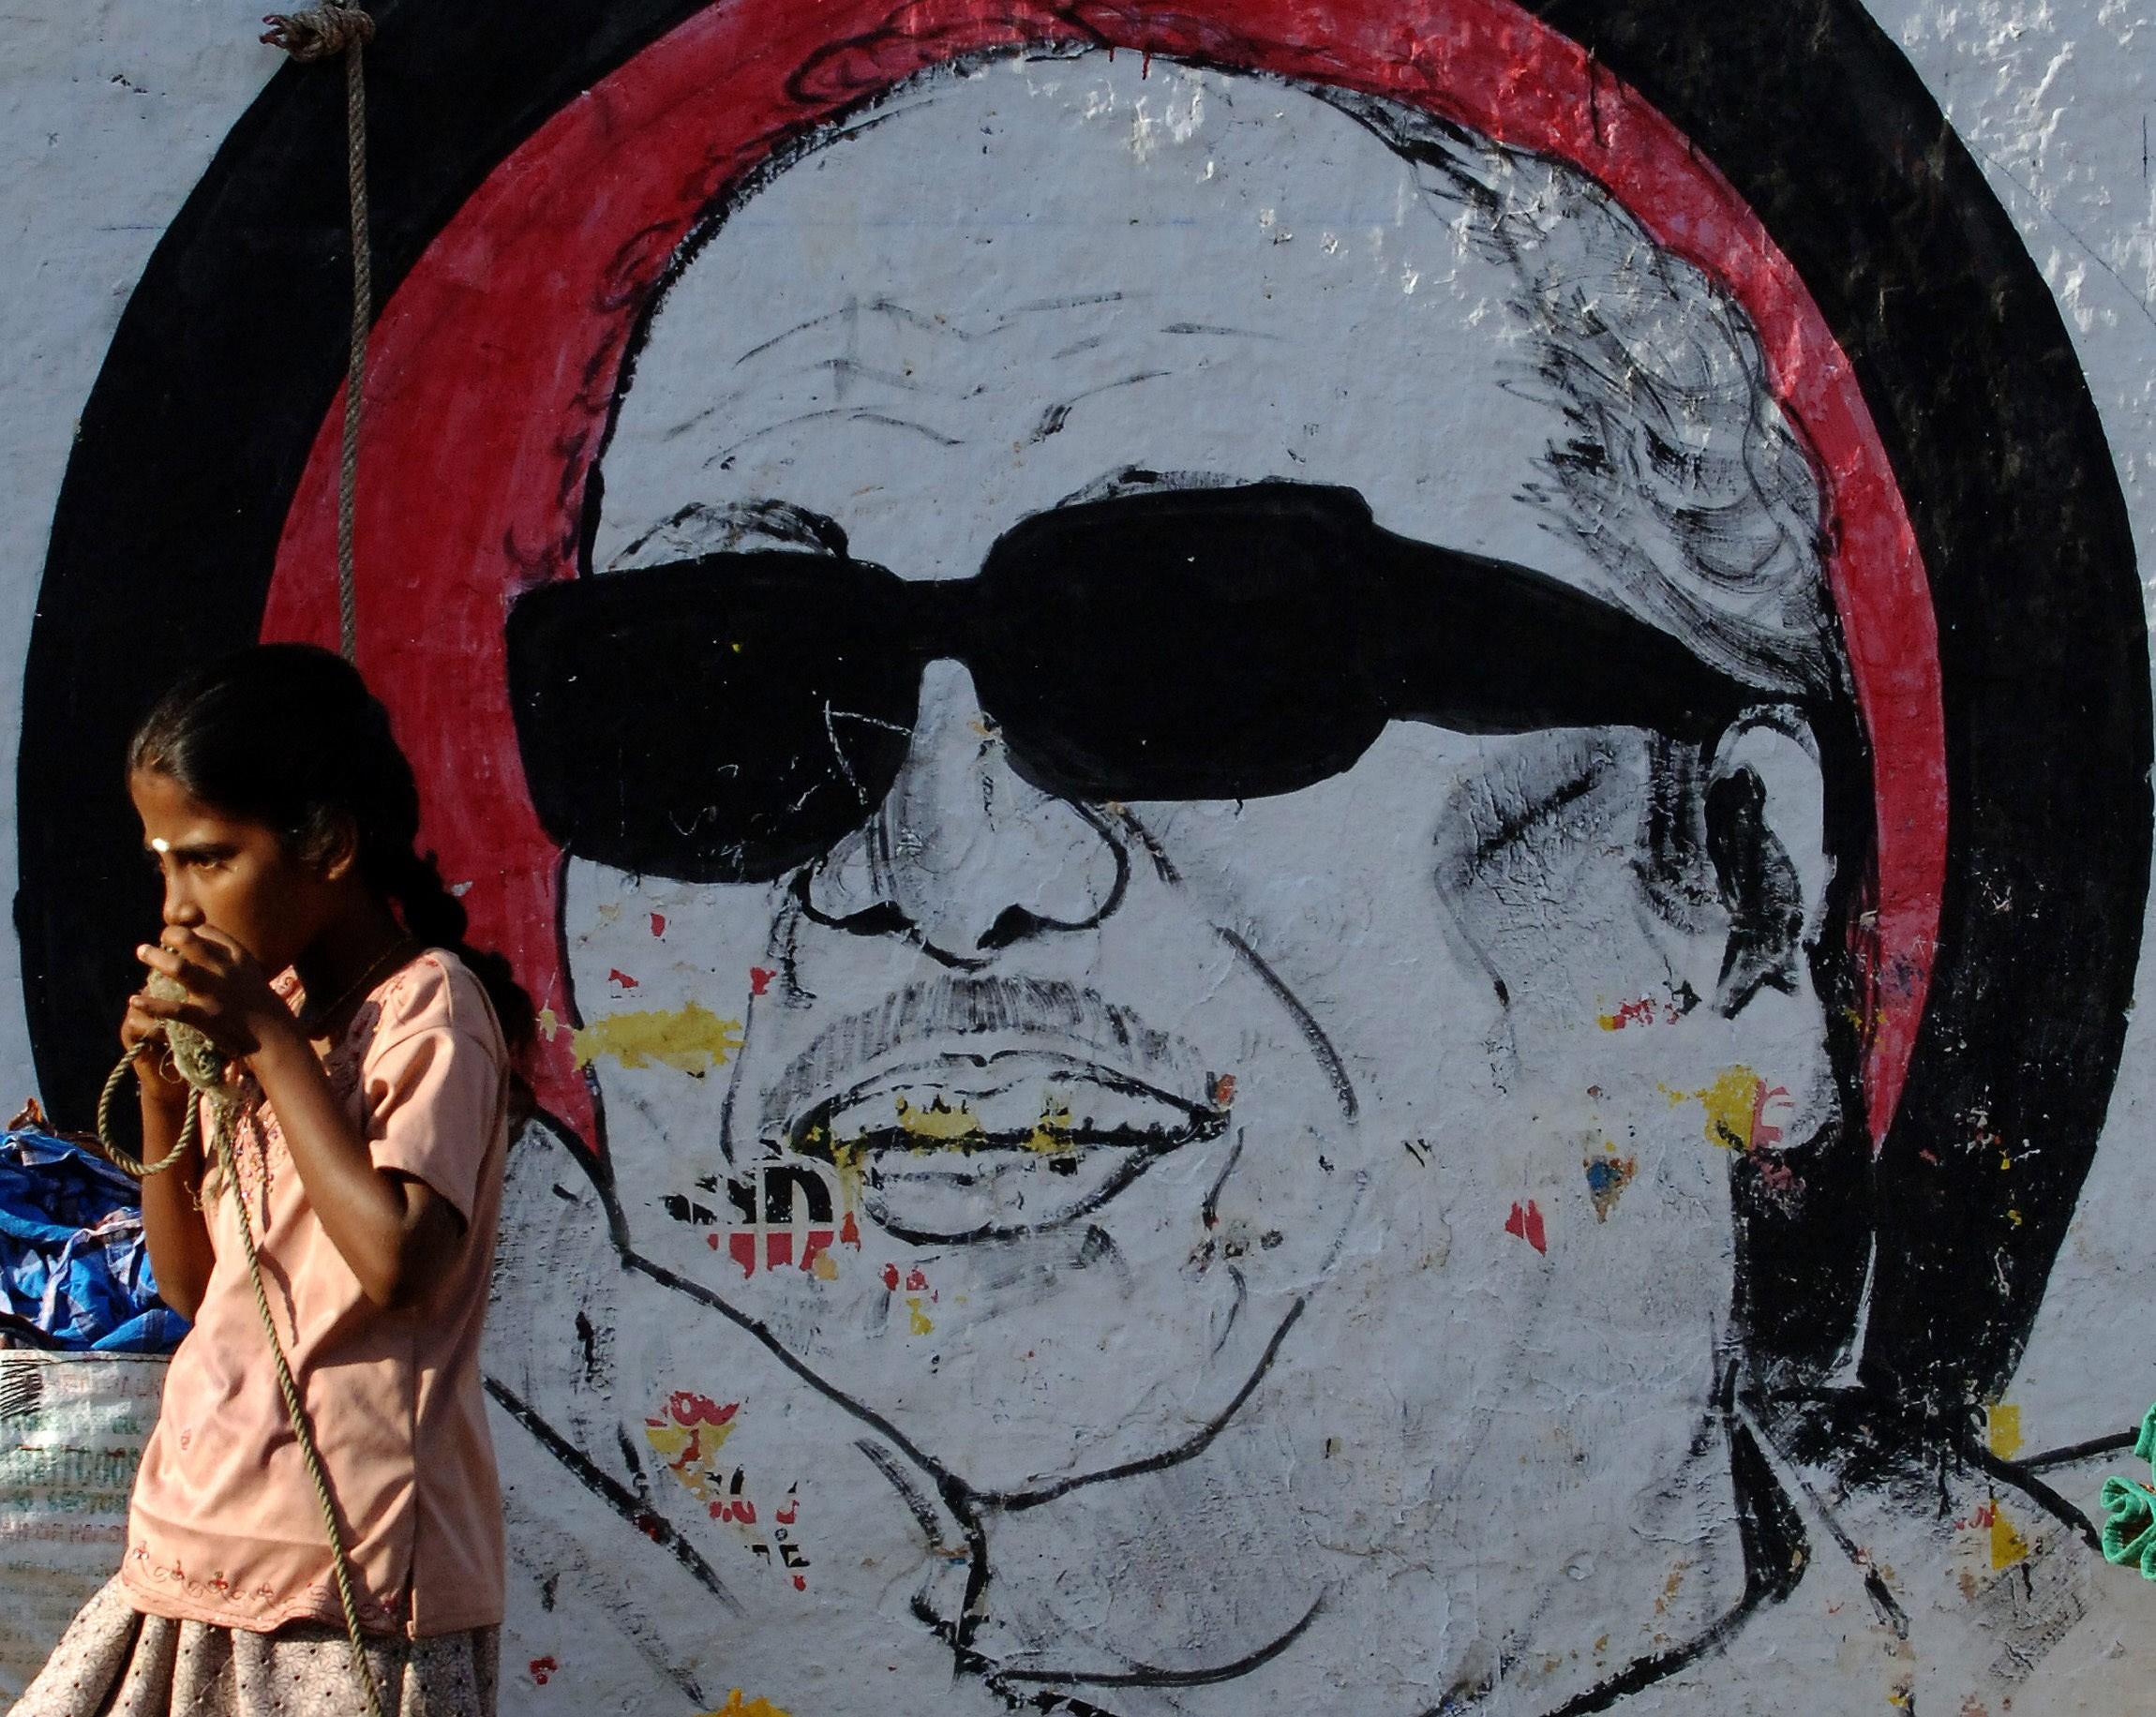 A Karunanidhi mural in Chennai. Credit: AFP